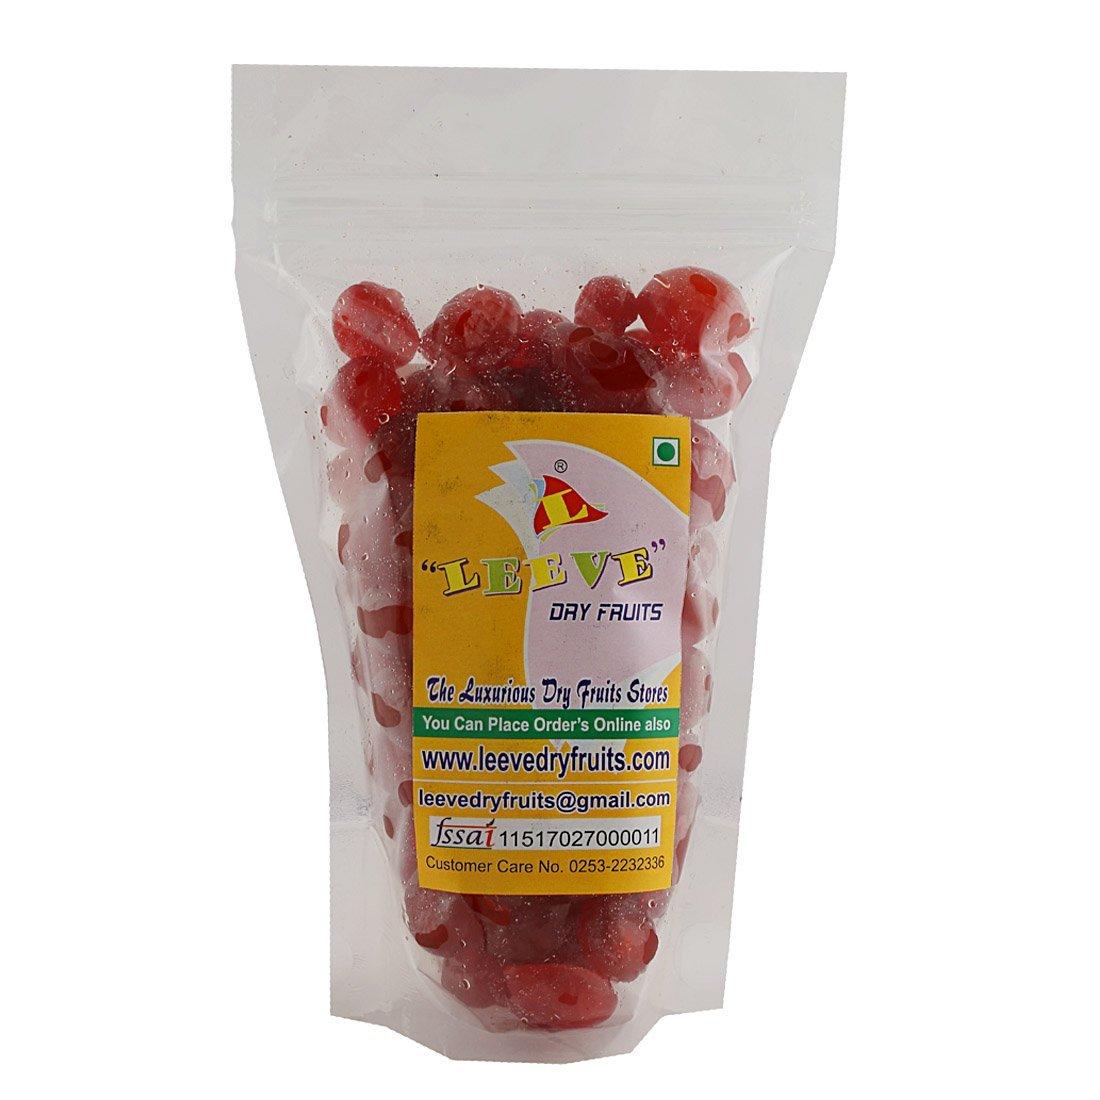 Leeve Dry Fruits Hole Red Cherries Glazed Karonada - 400 Gms